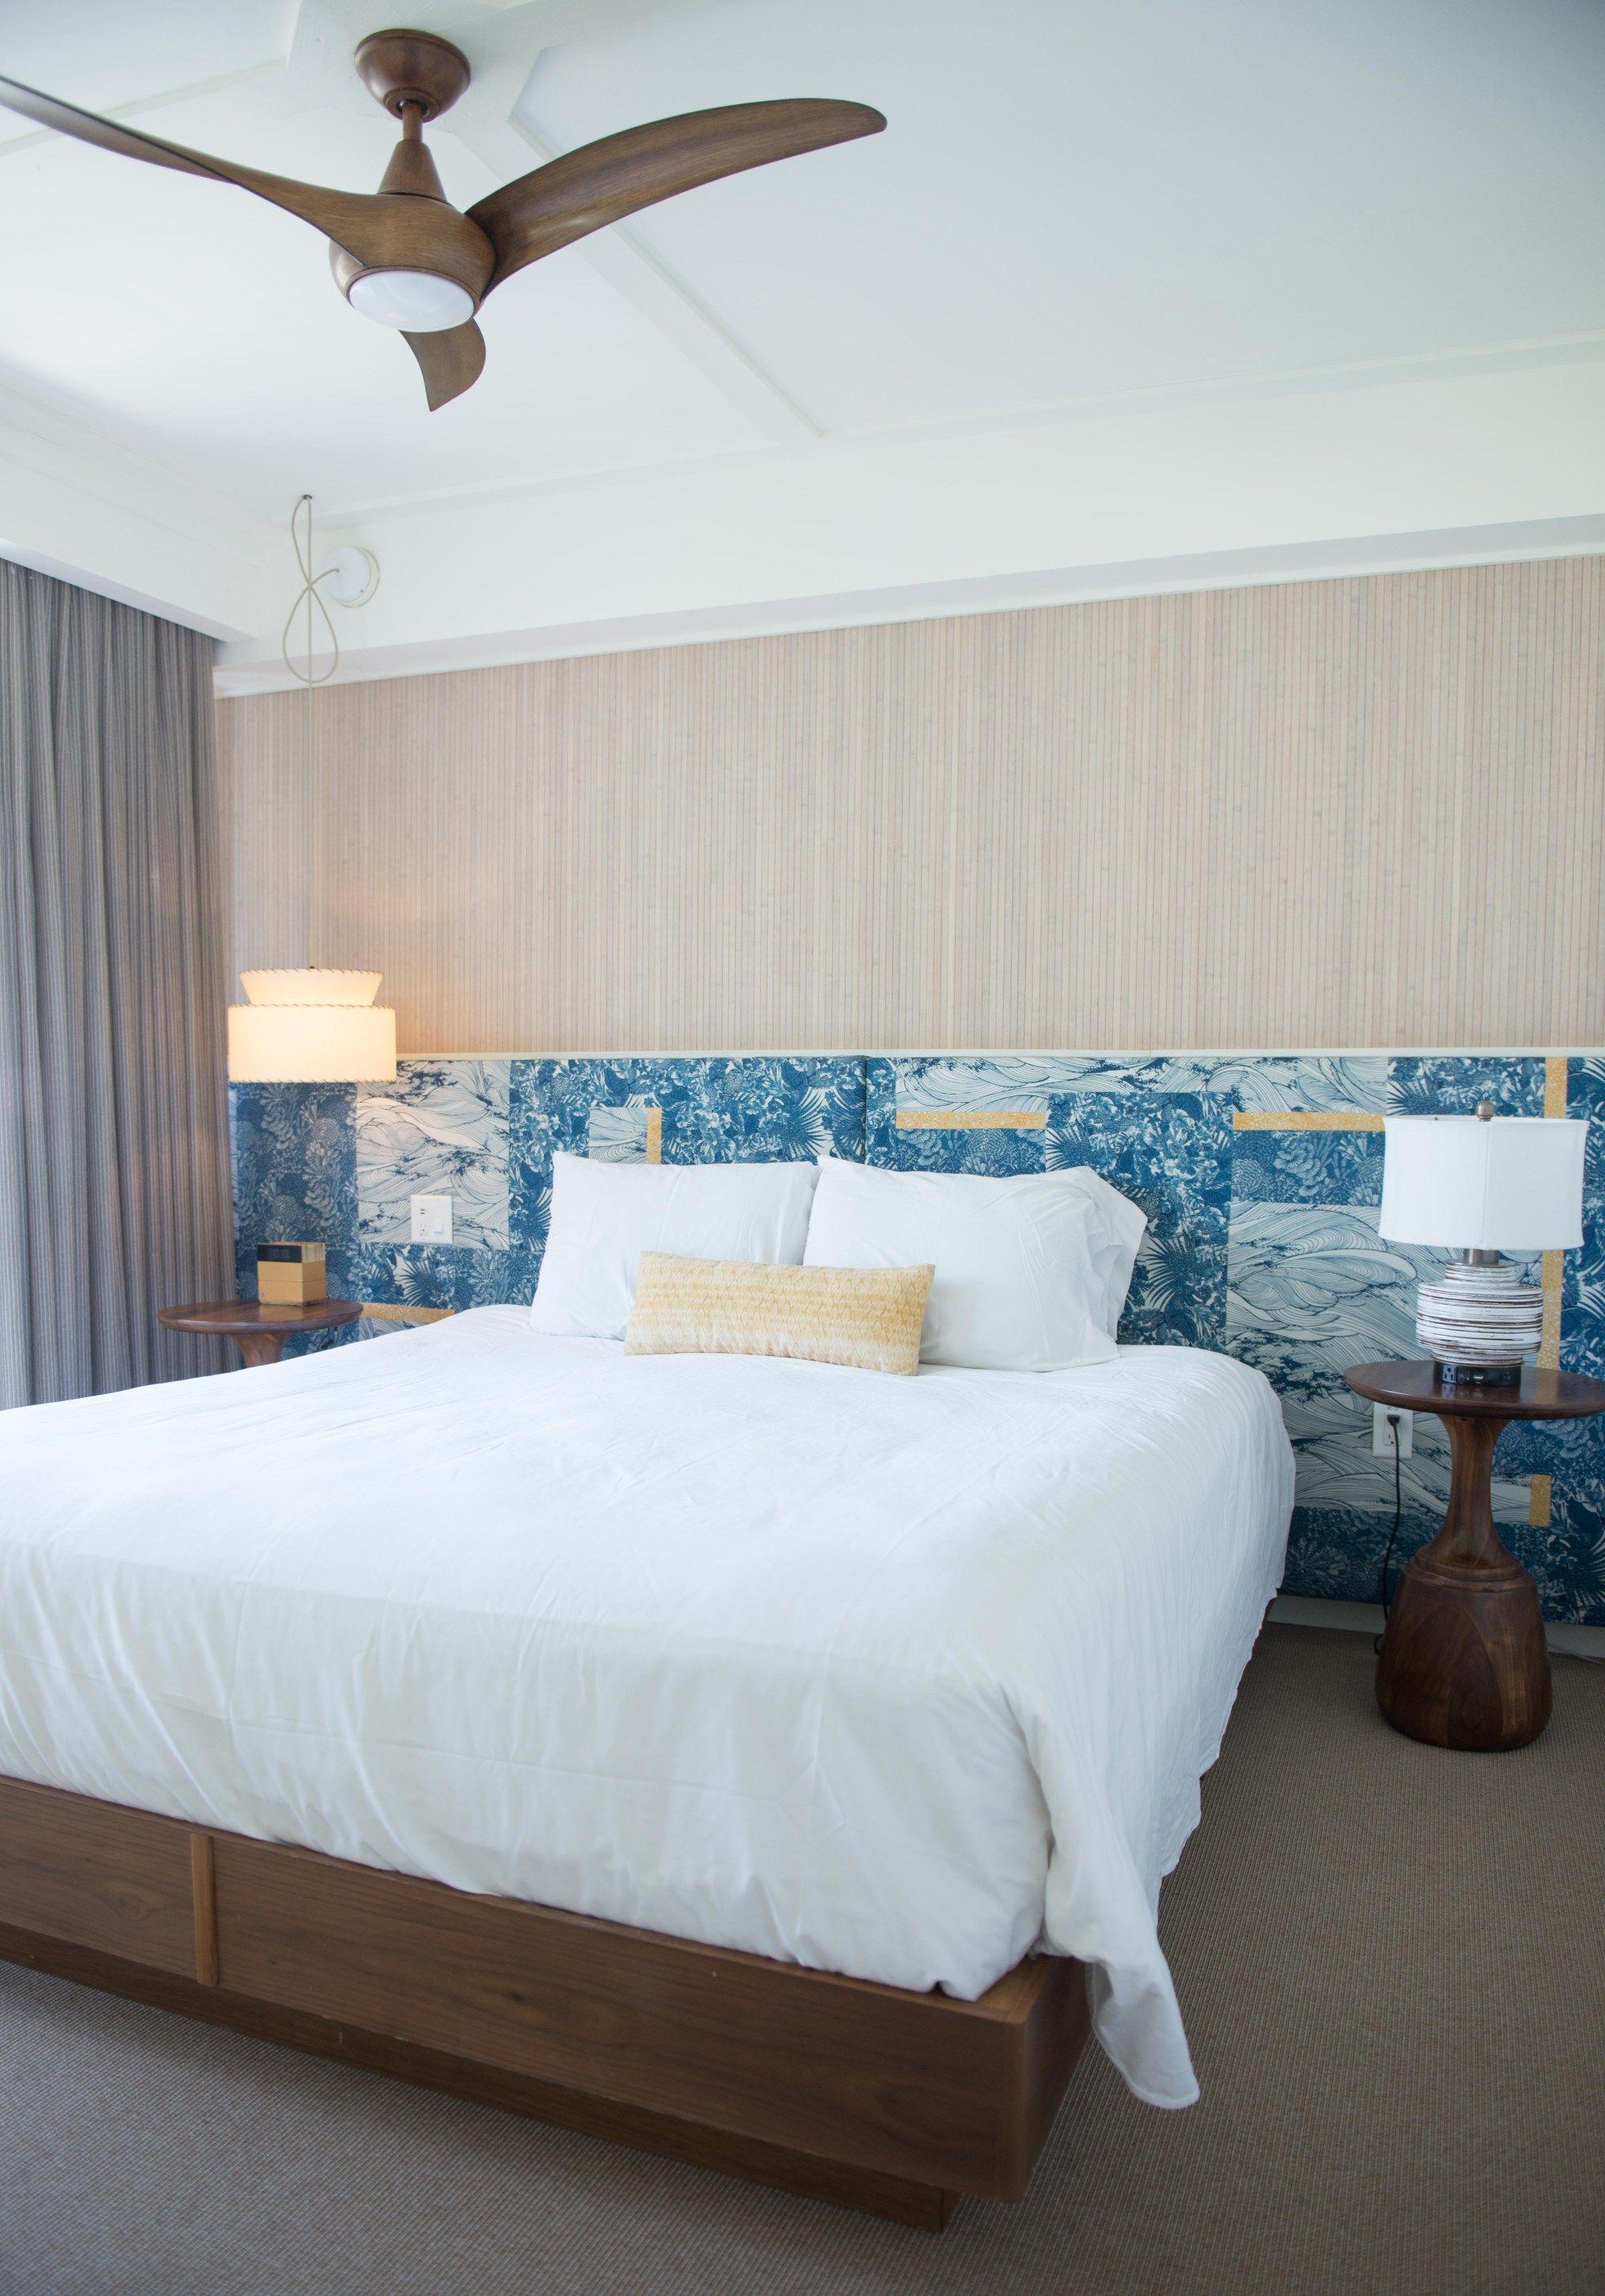 Twin Bed Hotel Room: Enjoy Local Hawaiian Hospitality At The Surfjack Hotel